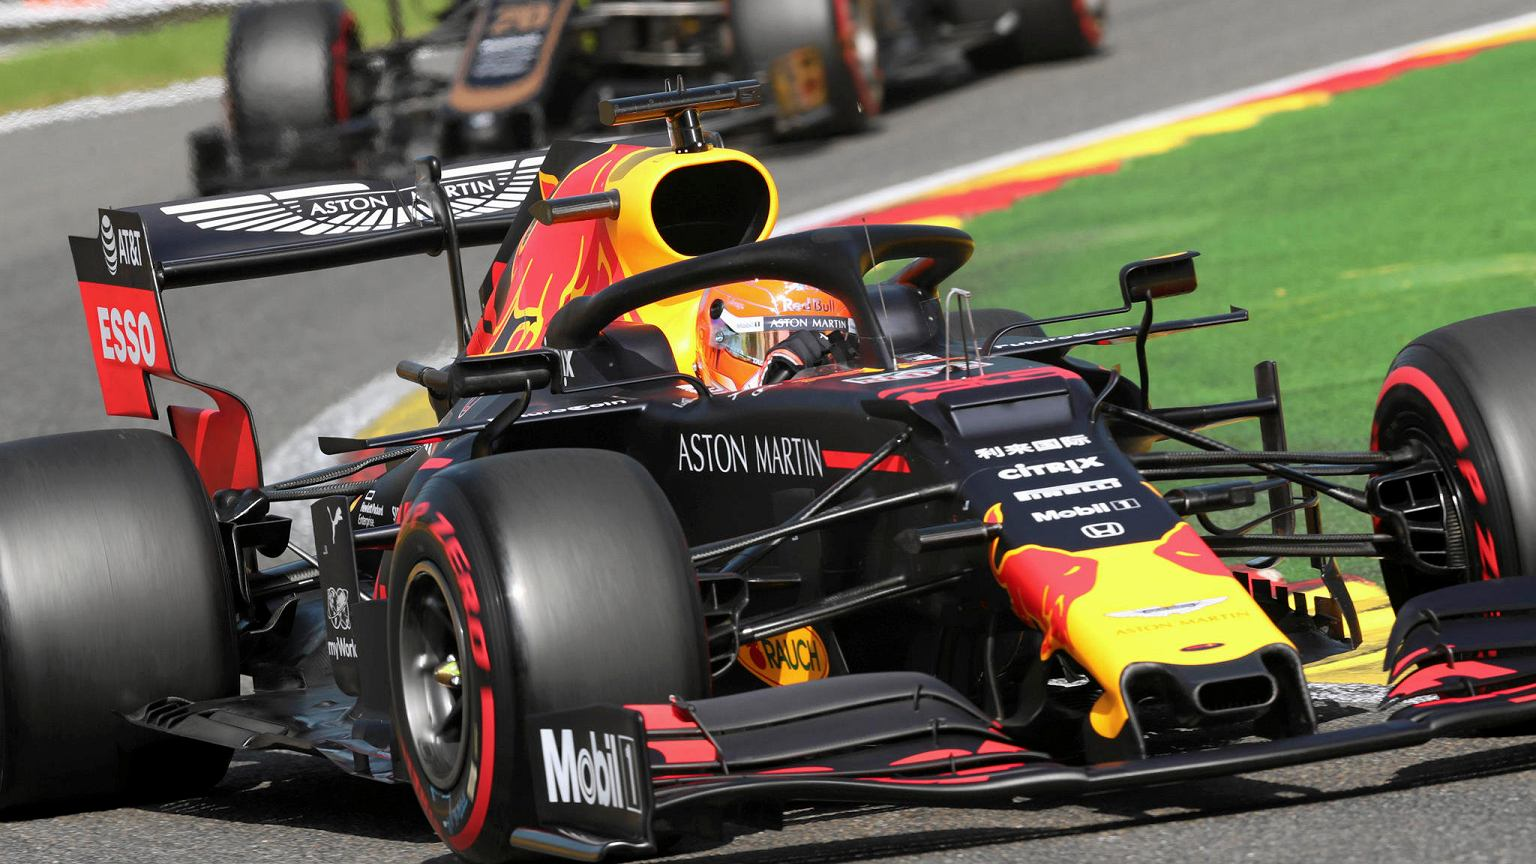 Max Verstappen mierzy się z problemami